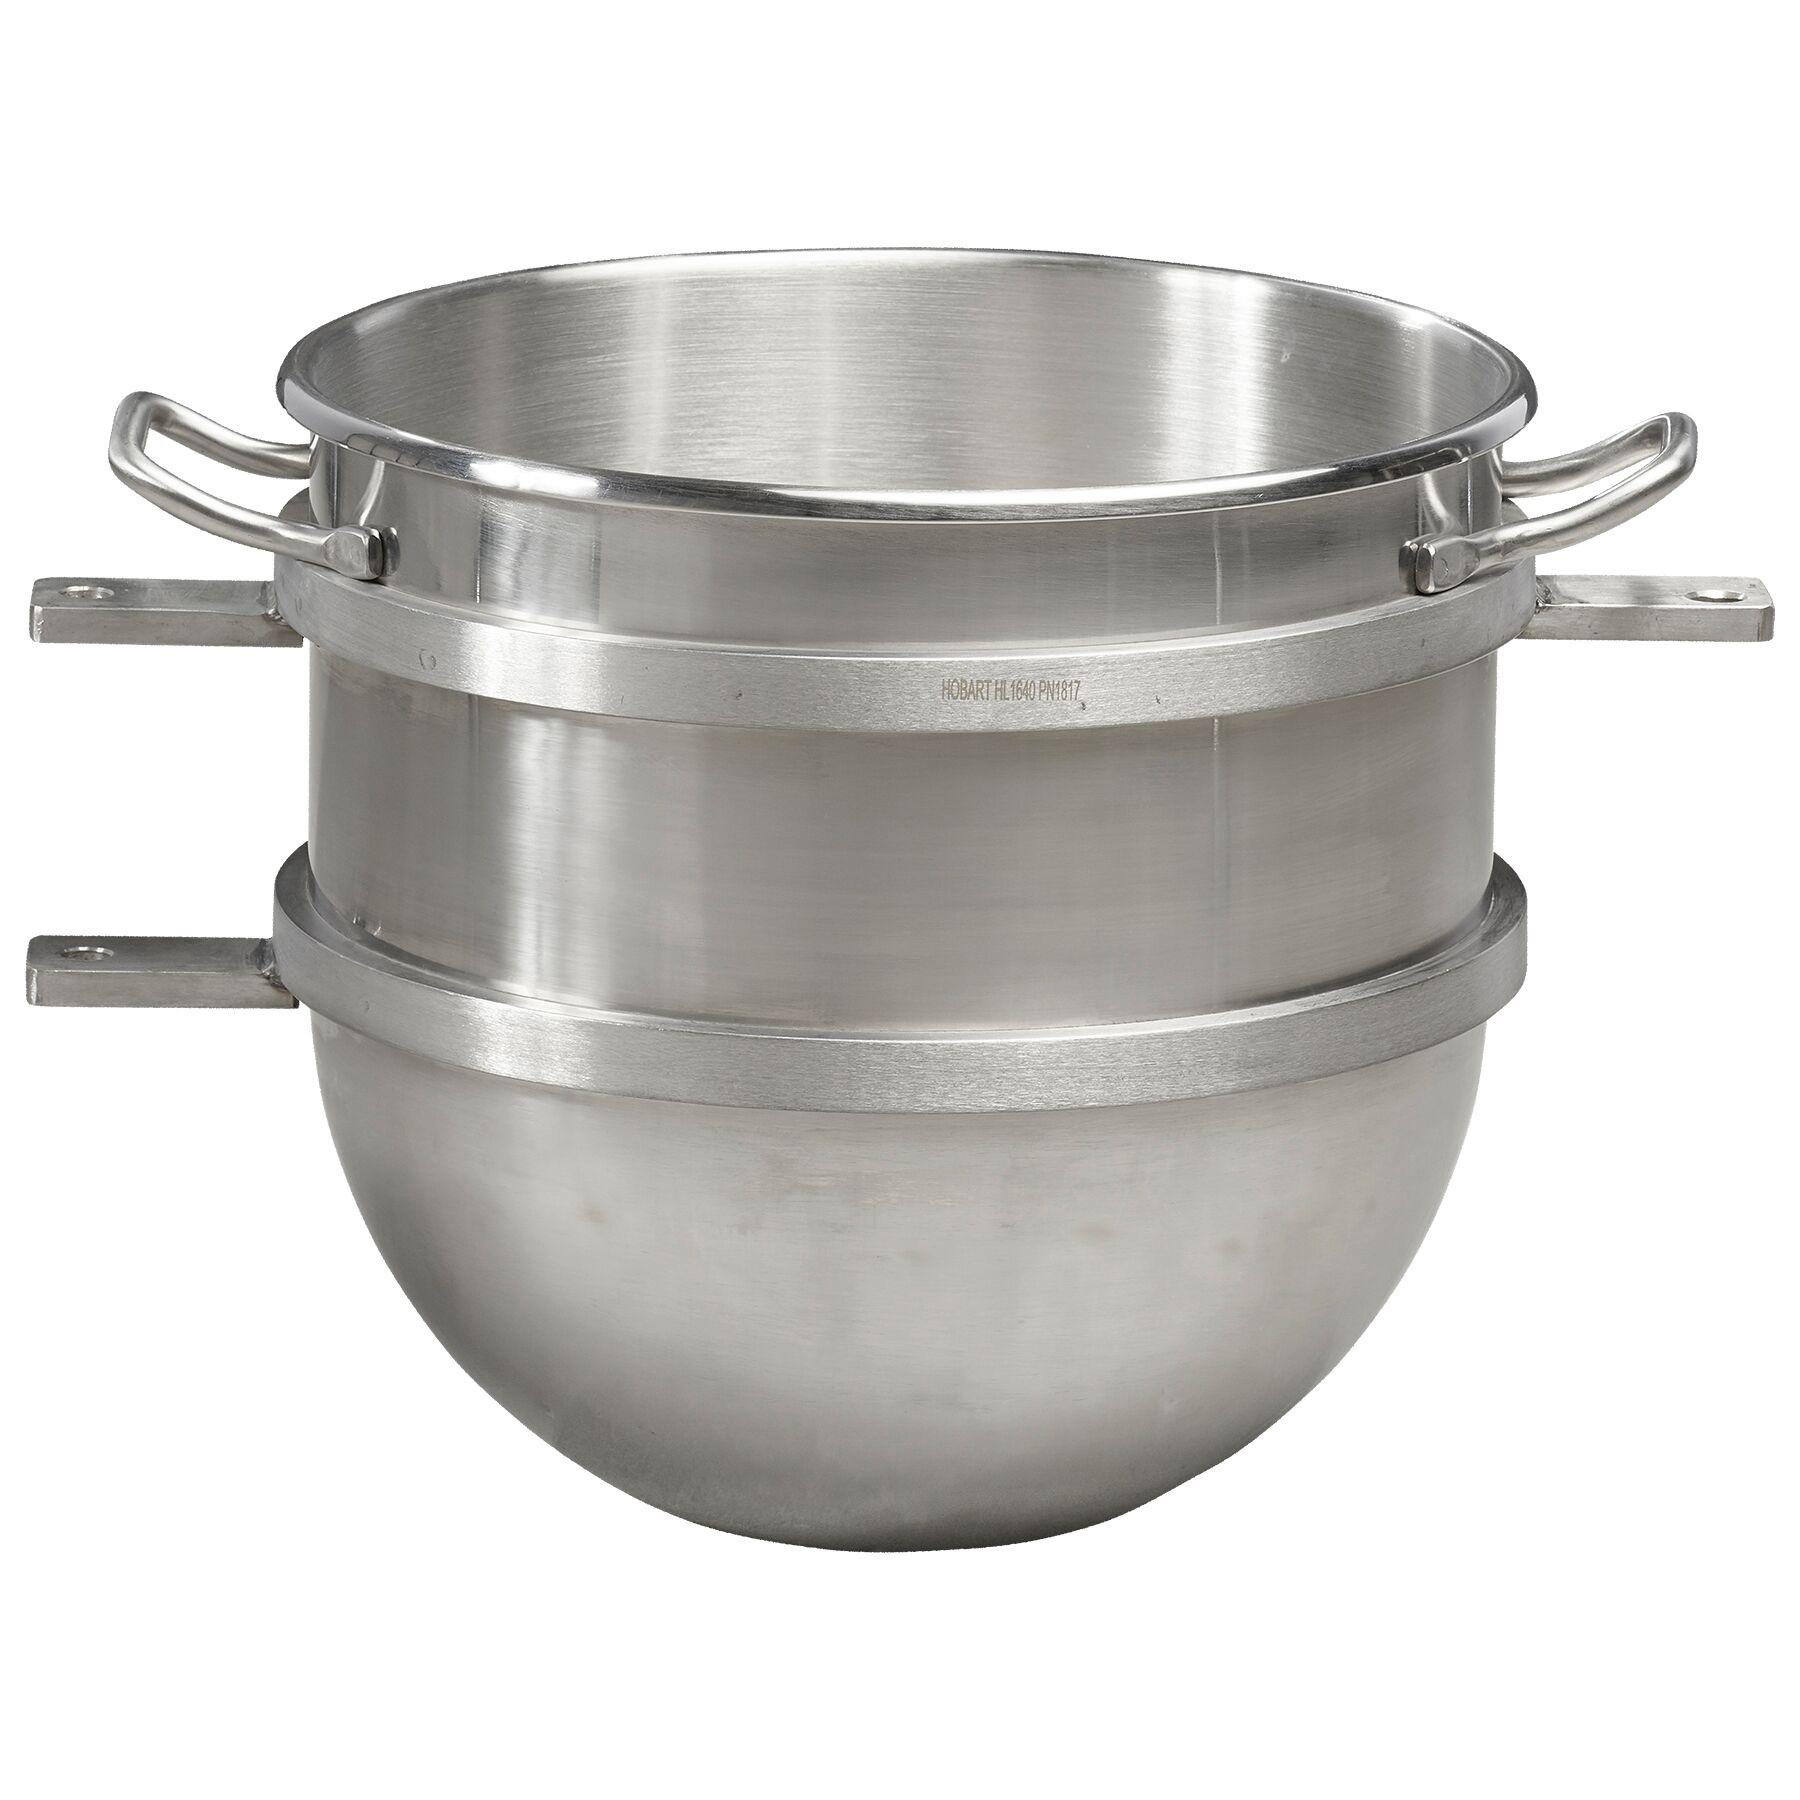 Hobart BOWL-HL4320 mixer bowl